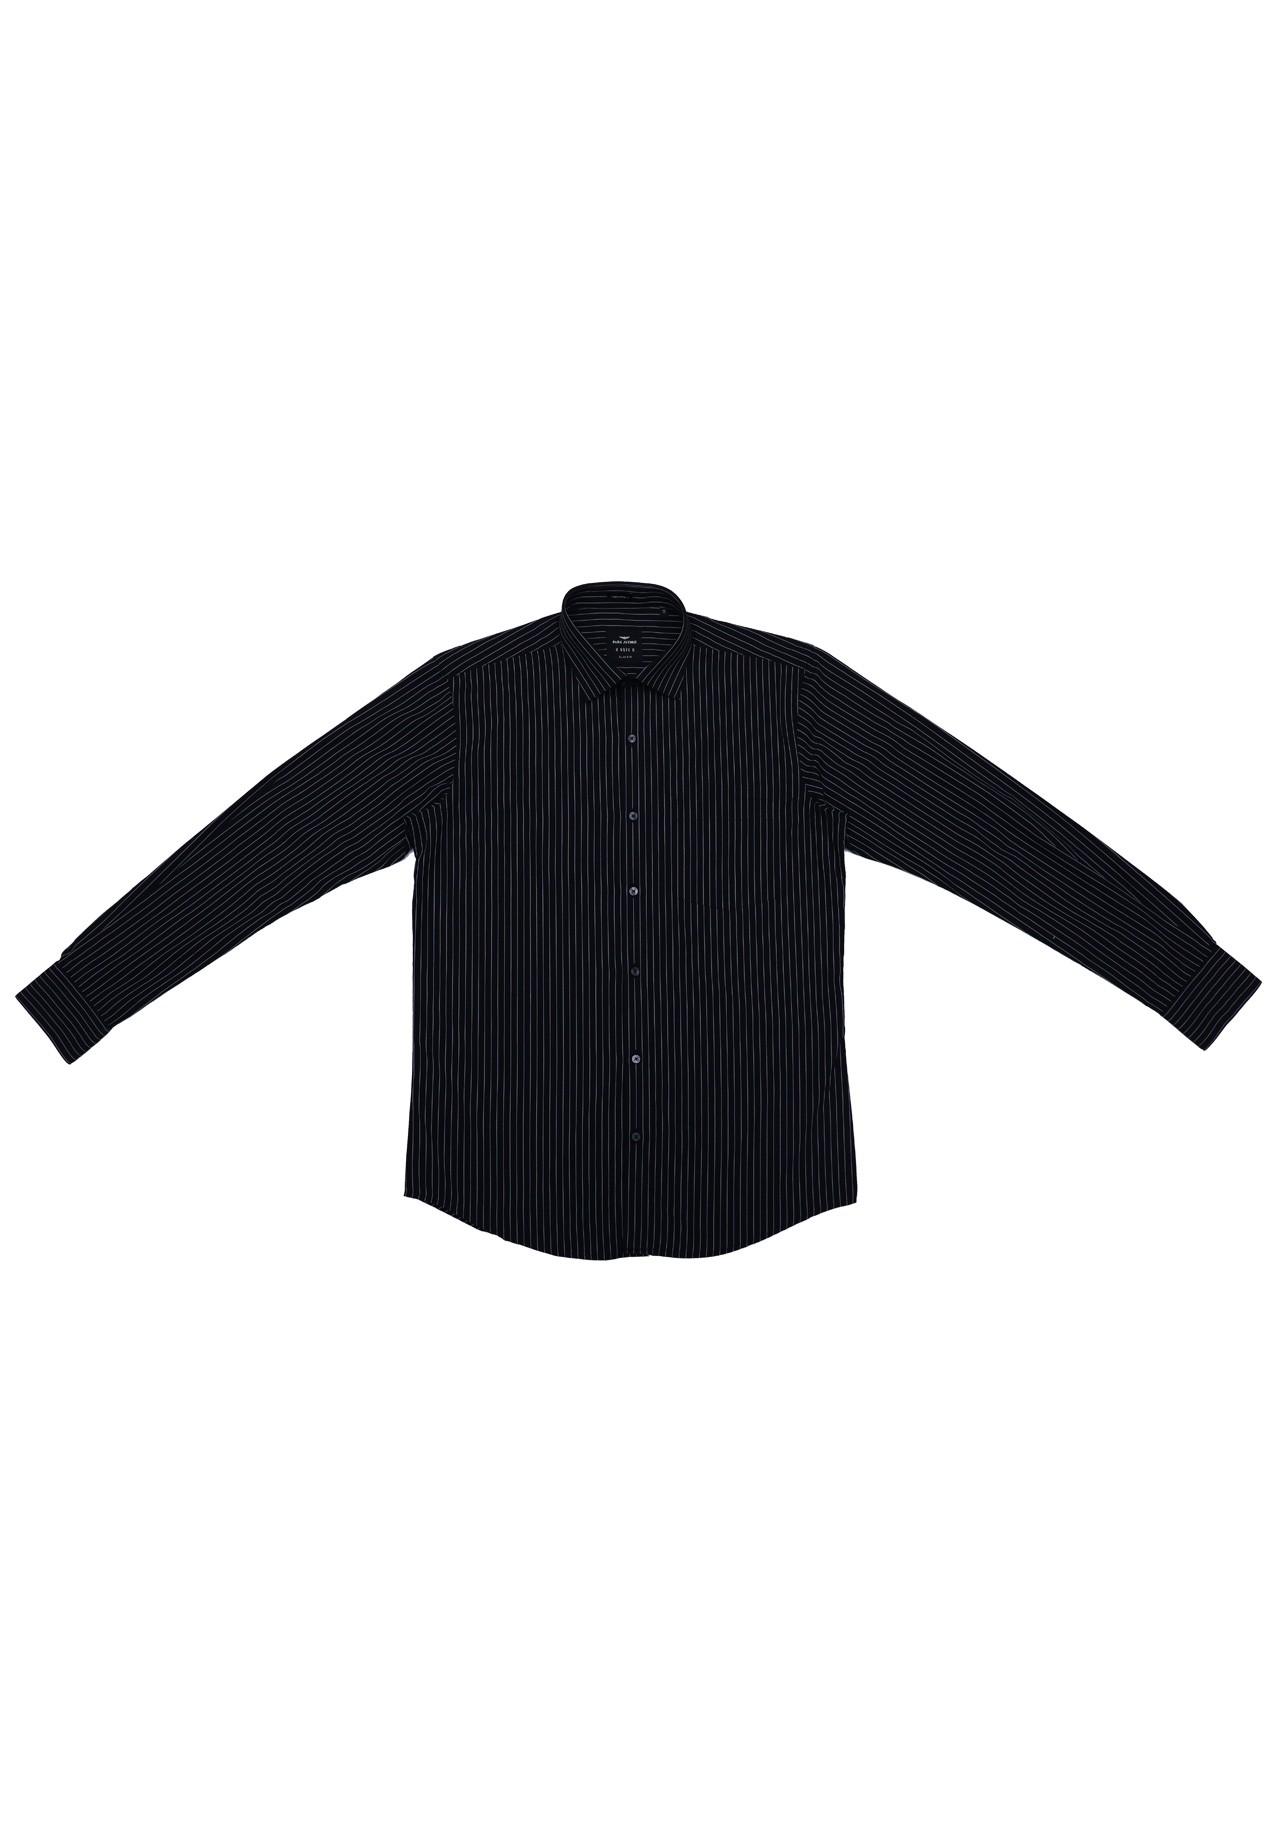 Park Avenue PMSX12282-K8 Mens Shirt